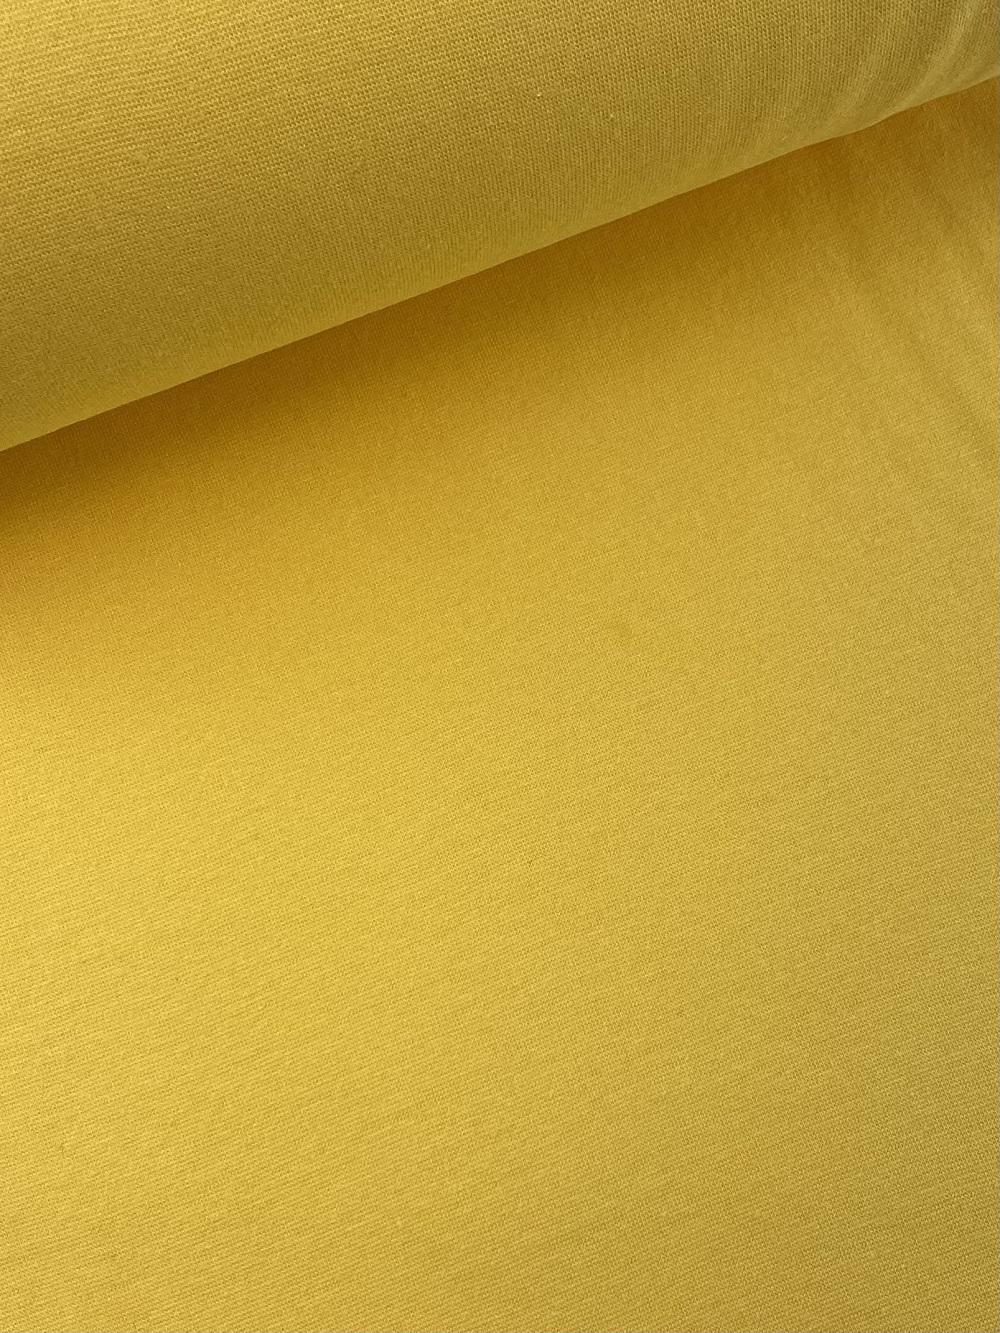 Bündchenware (glatt), gelb. Art. SW10645